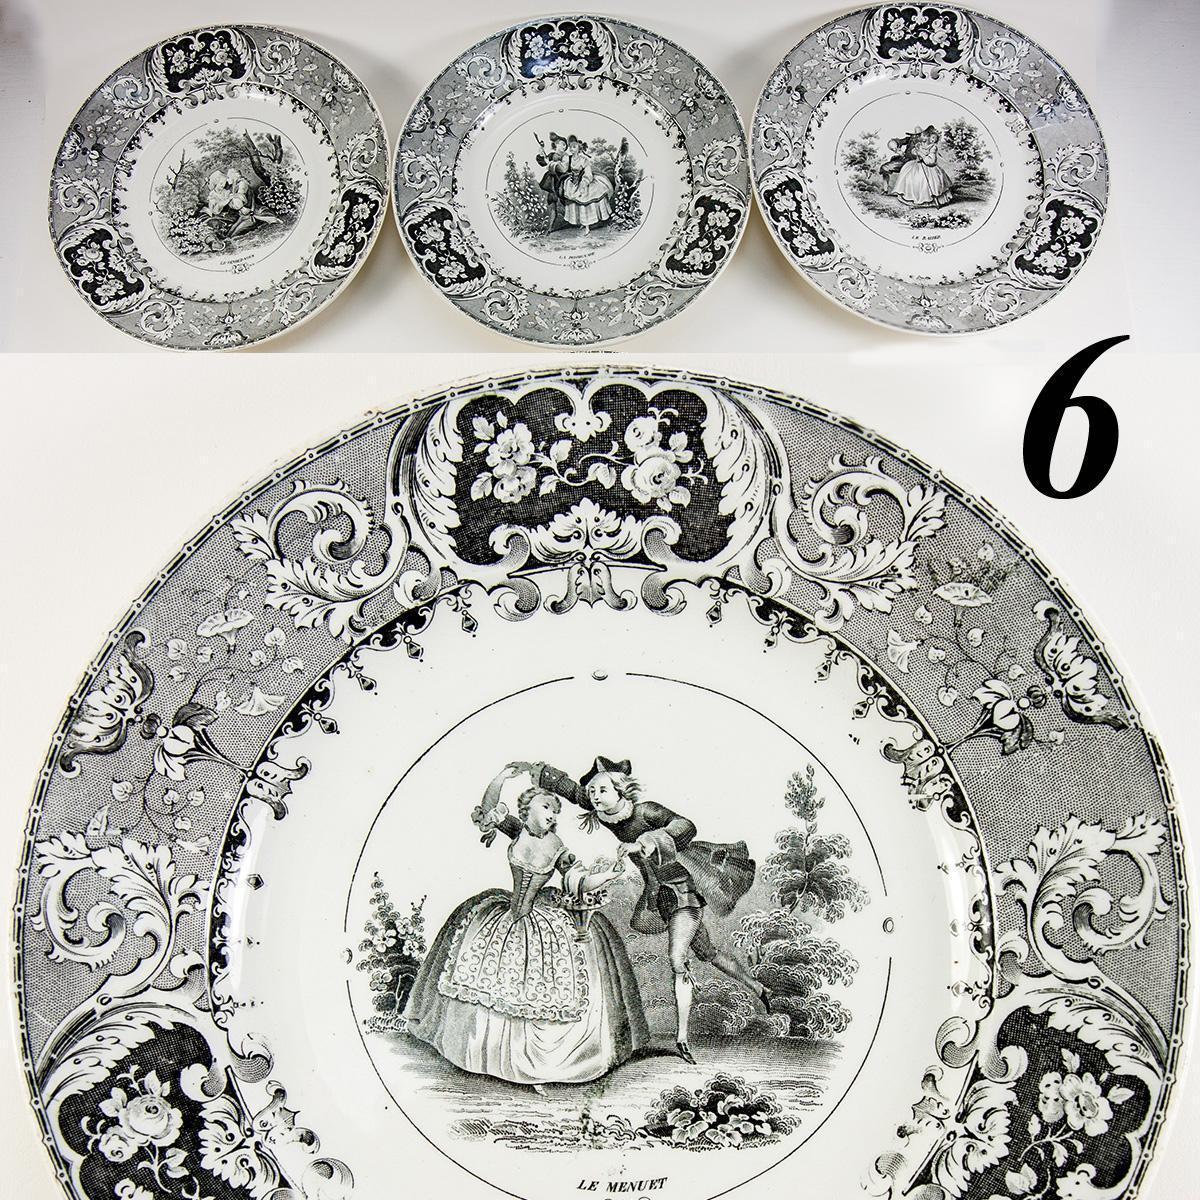 Set: 6 Antique Cabinet or Dessert Plates, French Story Plates, B&W, Milliet Creil-Montereau faience